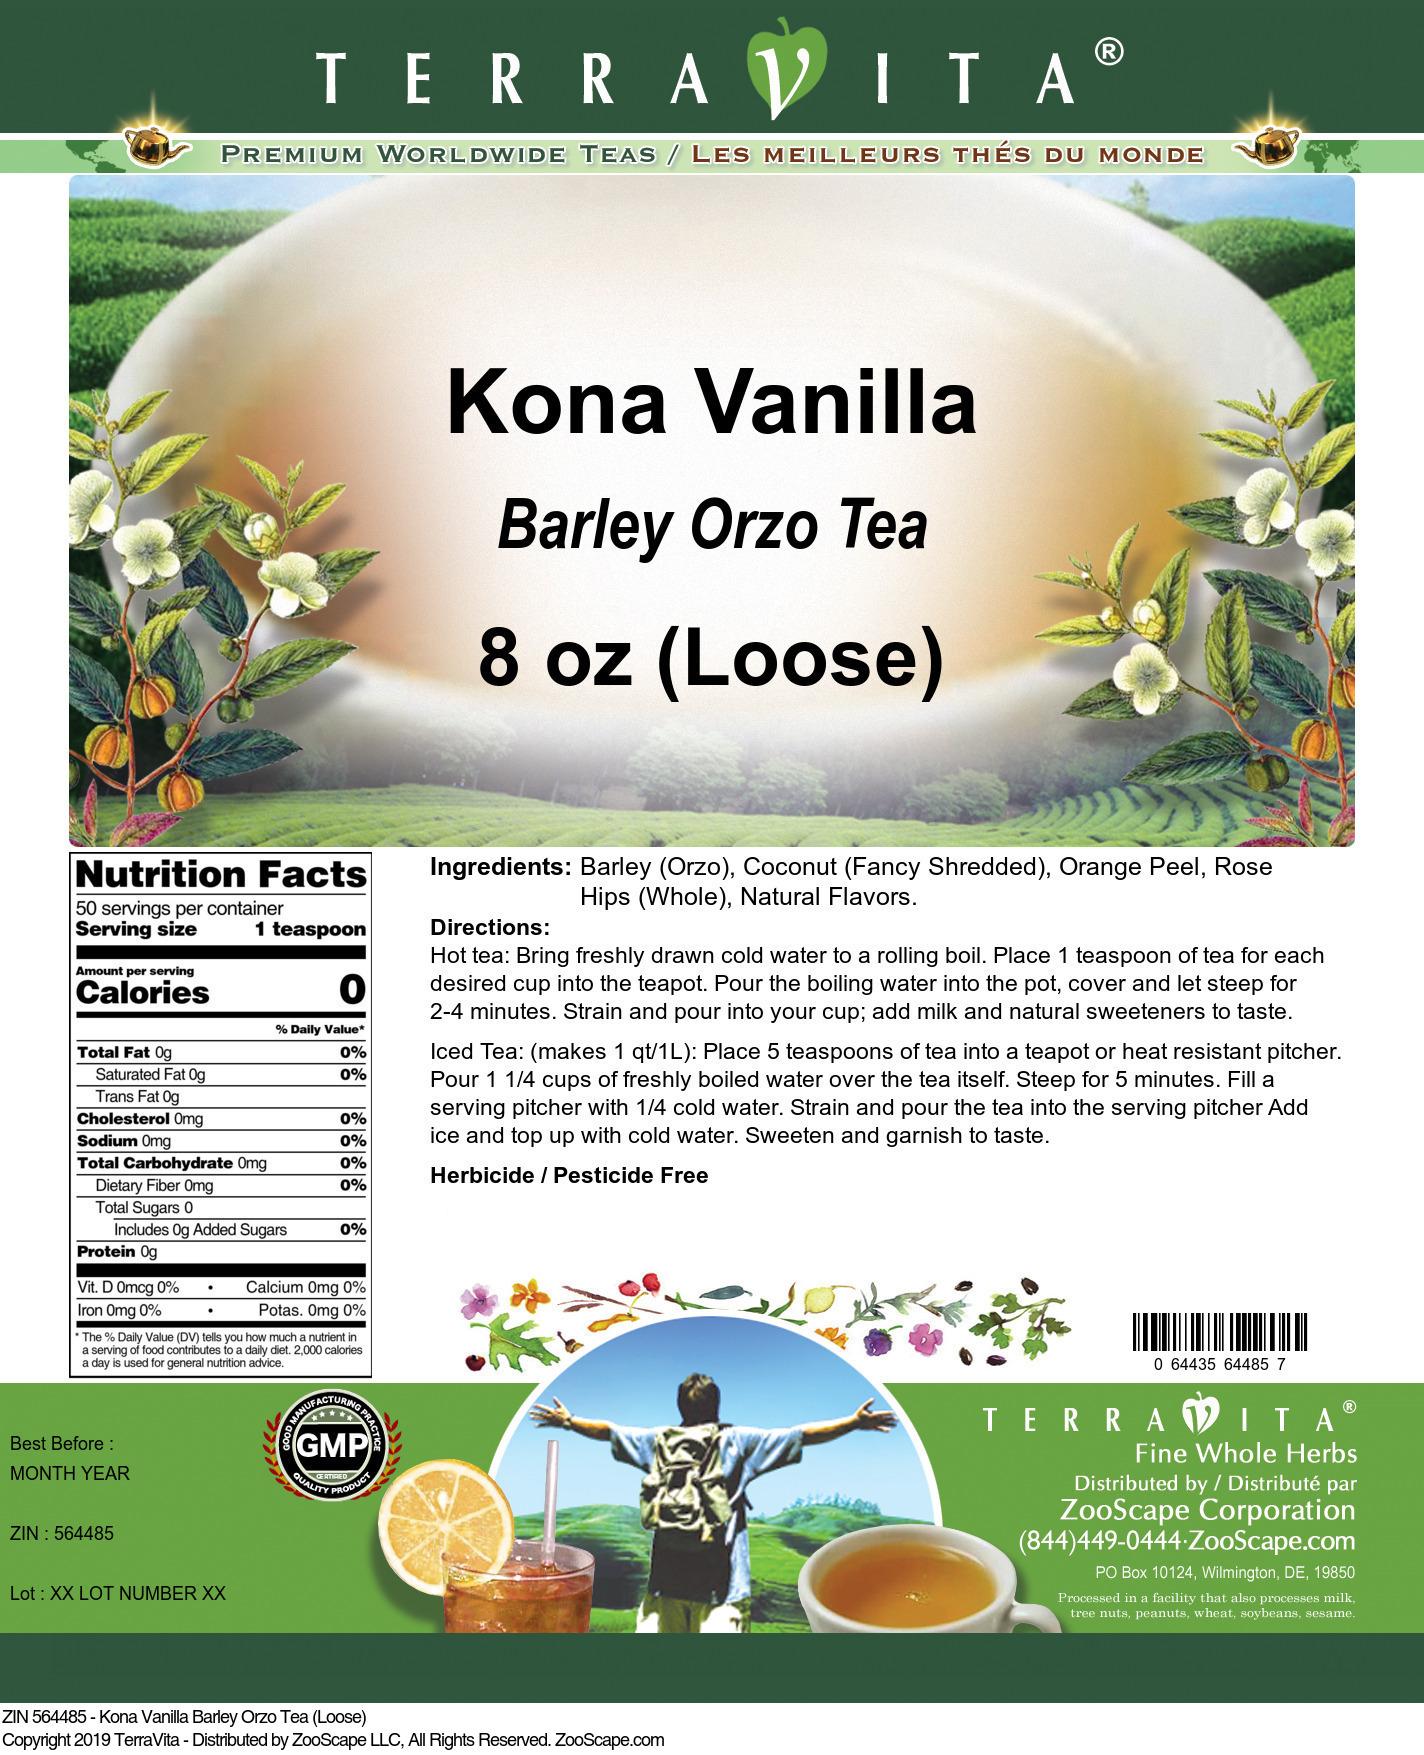 Kona Vanilla Barley Orzo